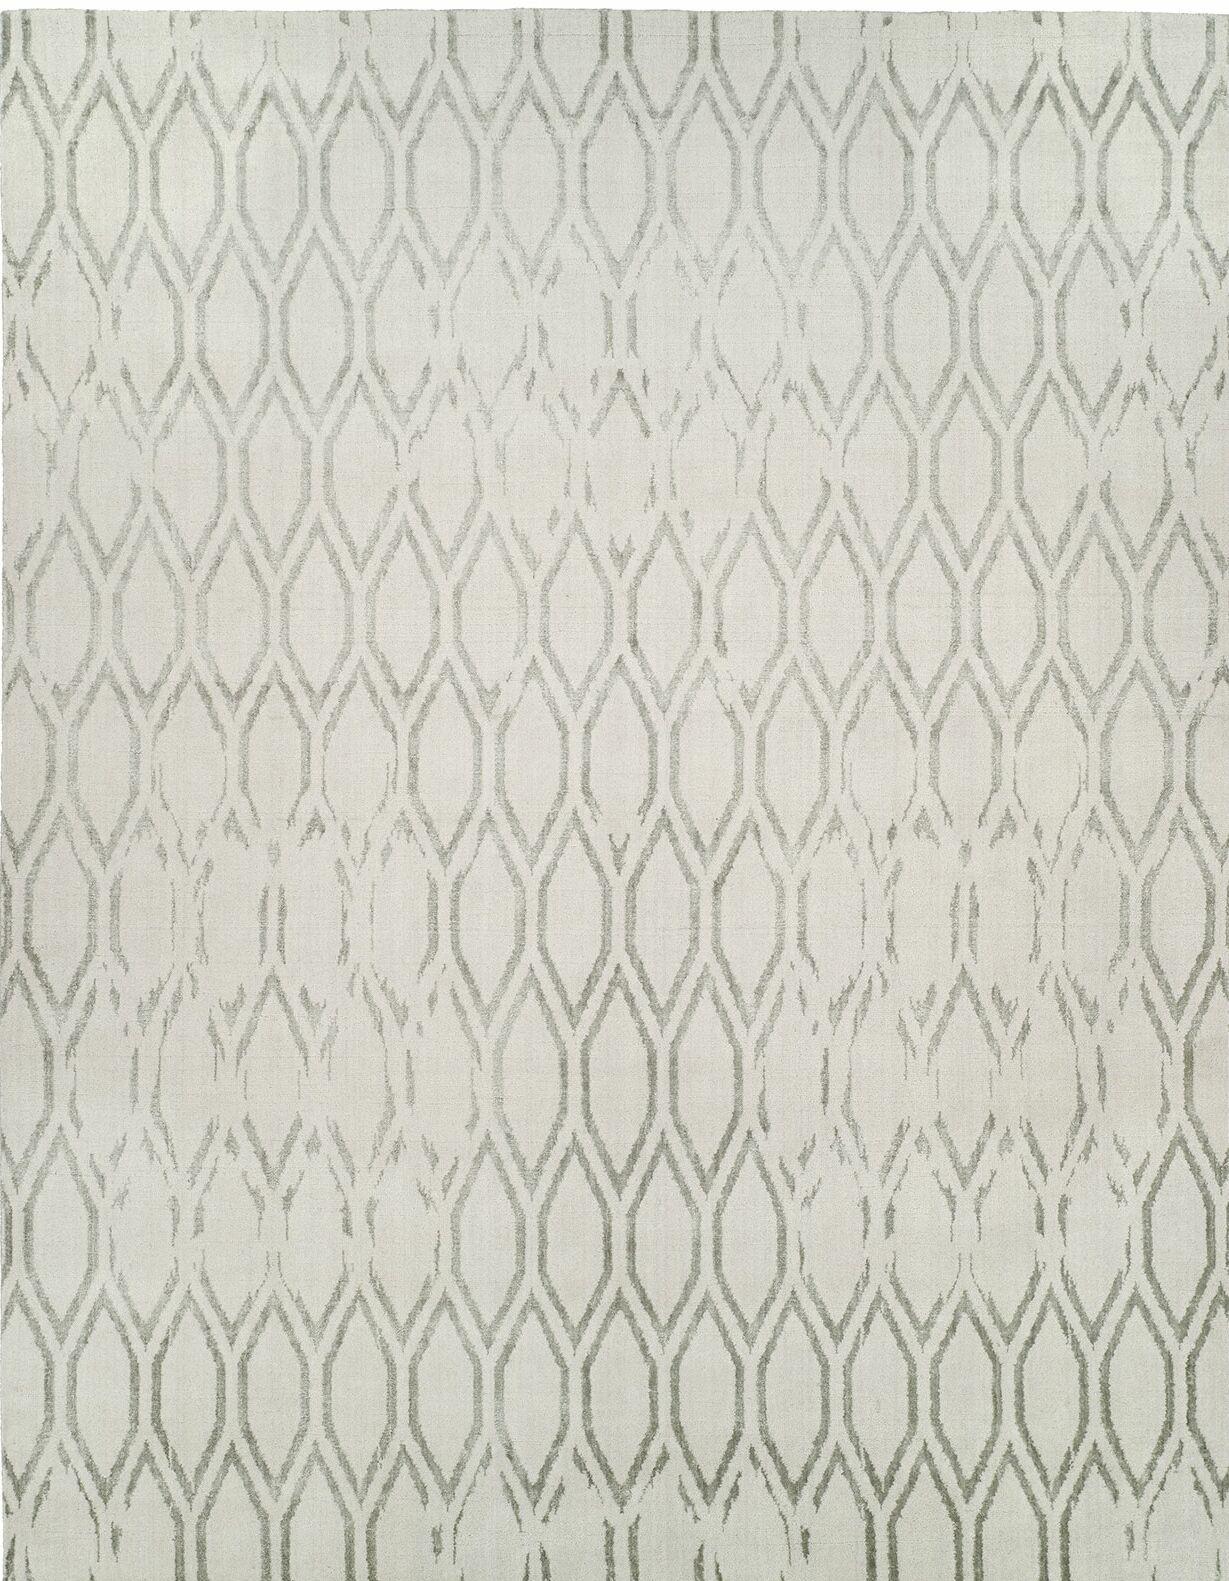 Hand-Woven Gray Area Rug Rug Size: 10' x 14'